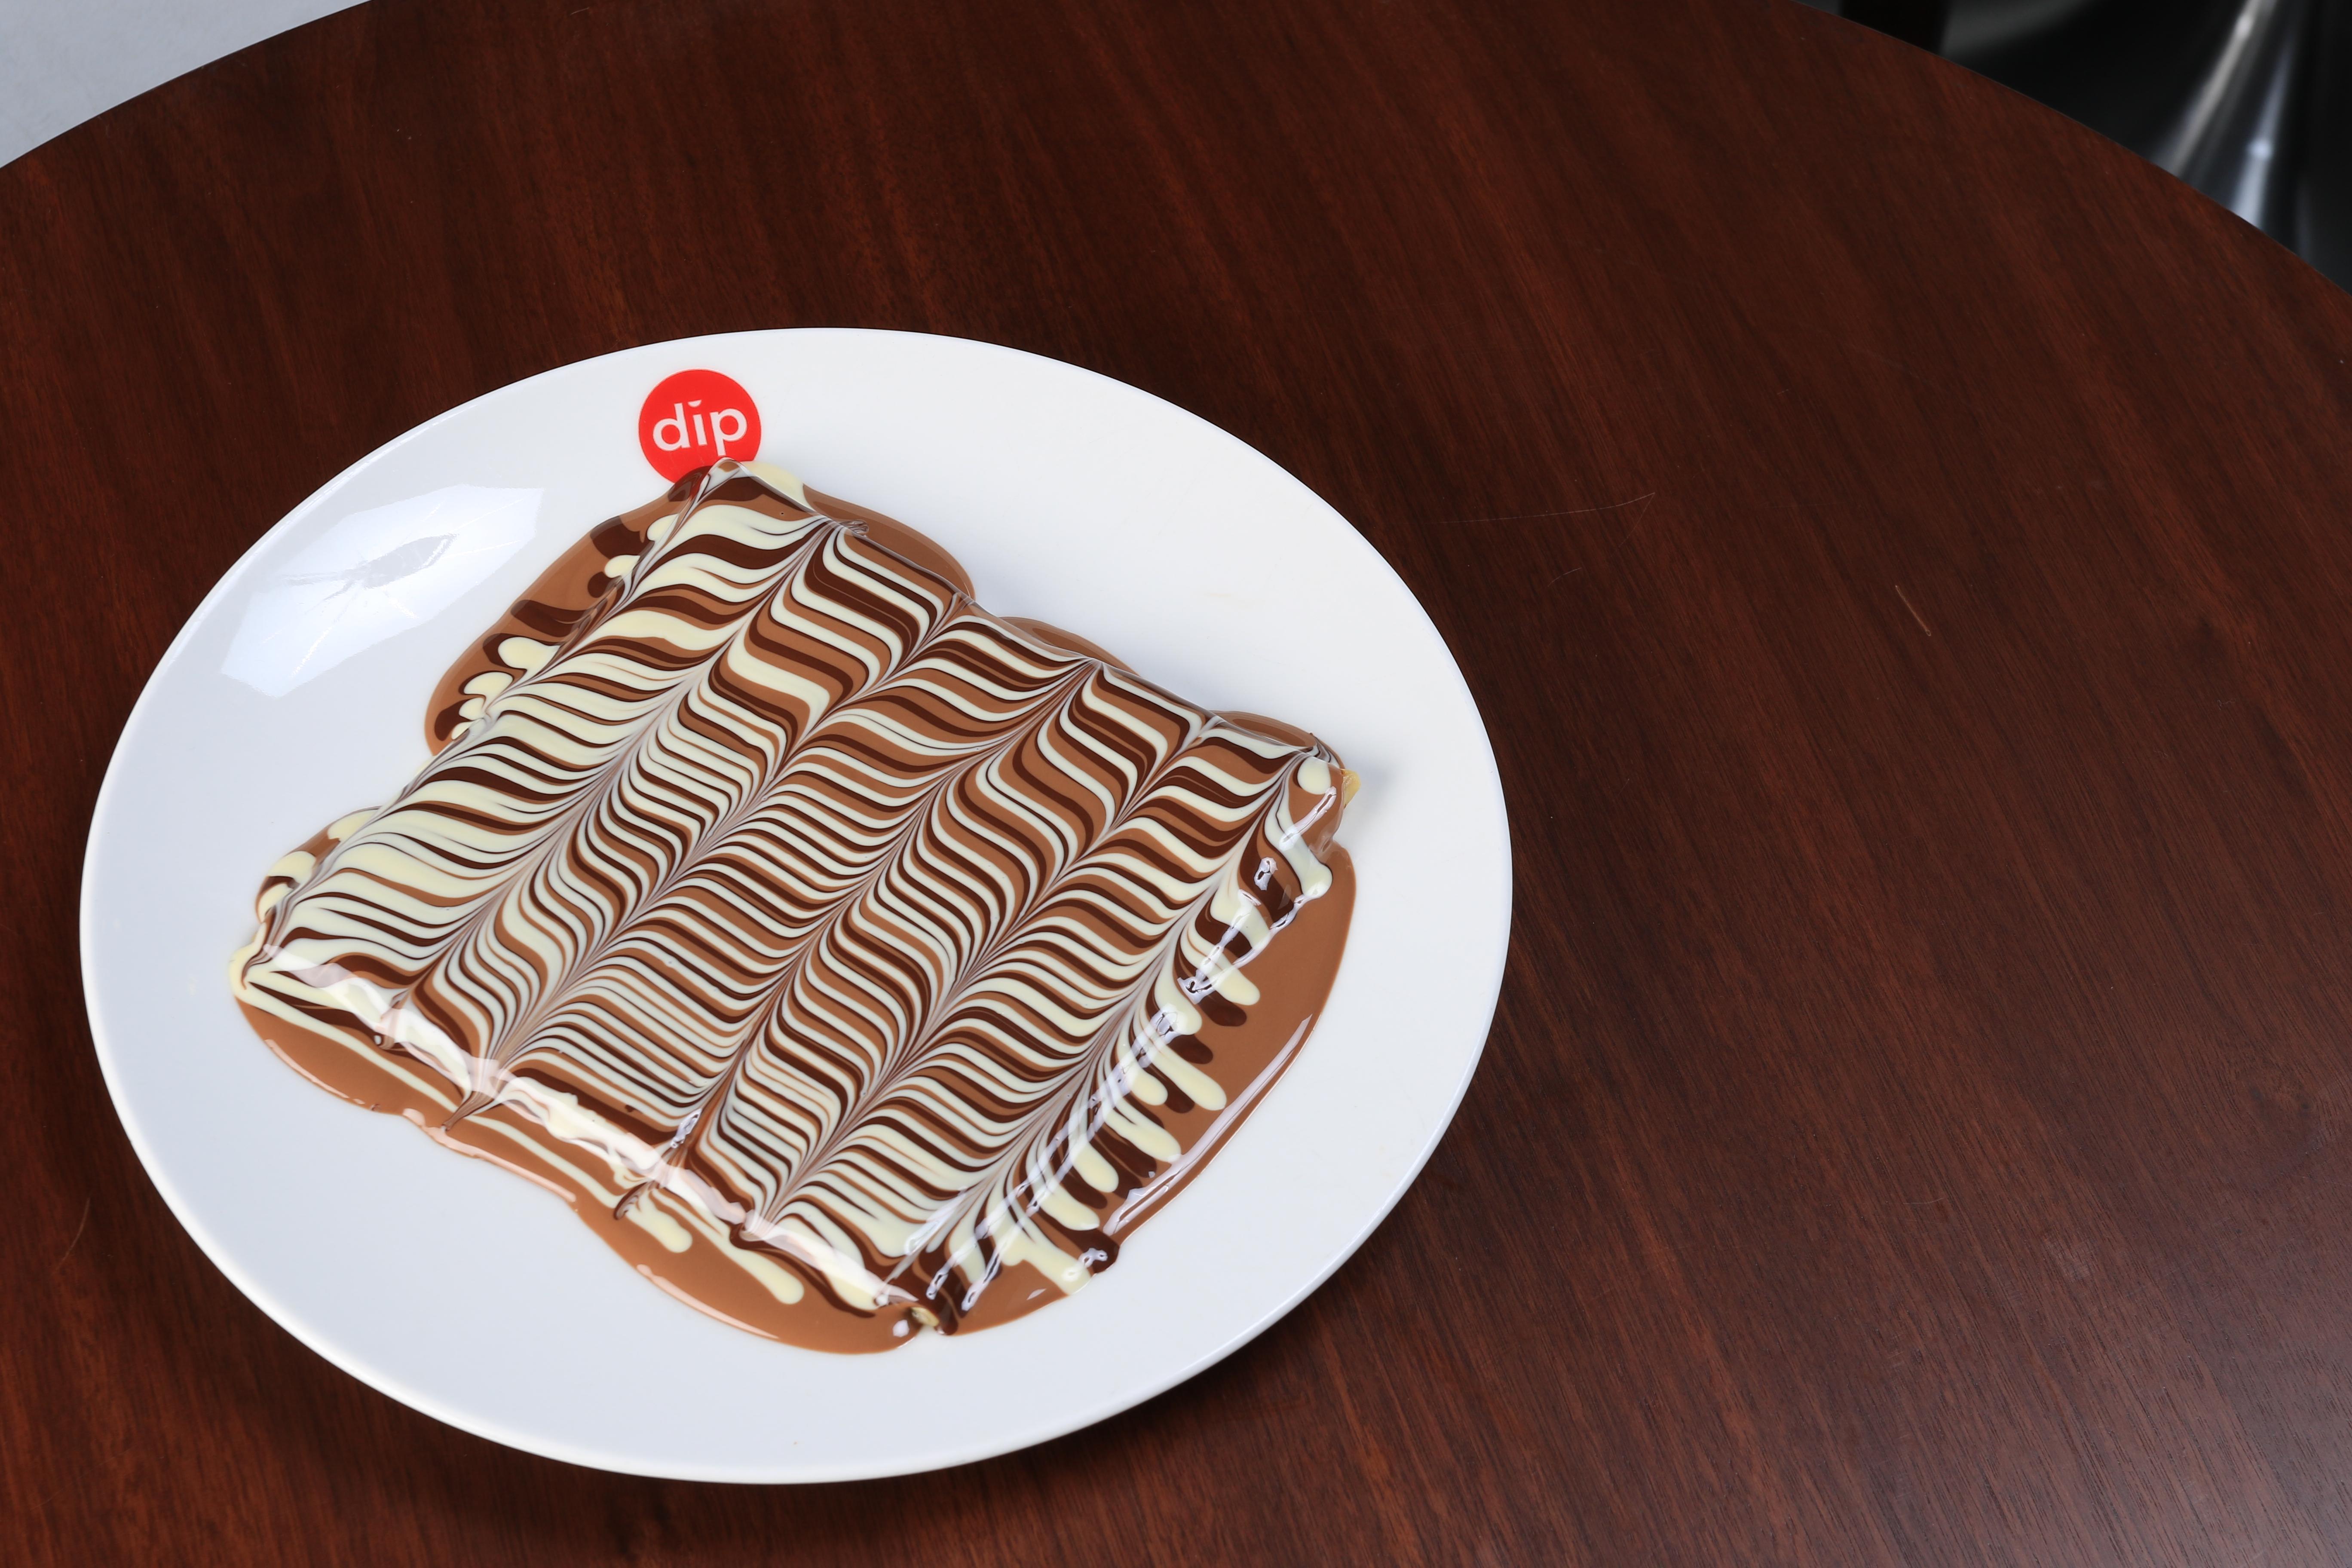 Oman dining: This weekend eat at Dipndip